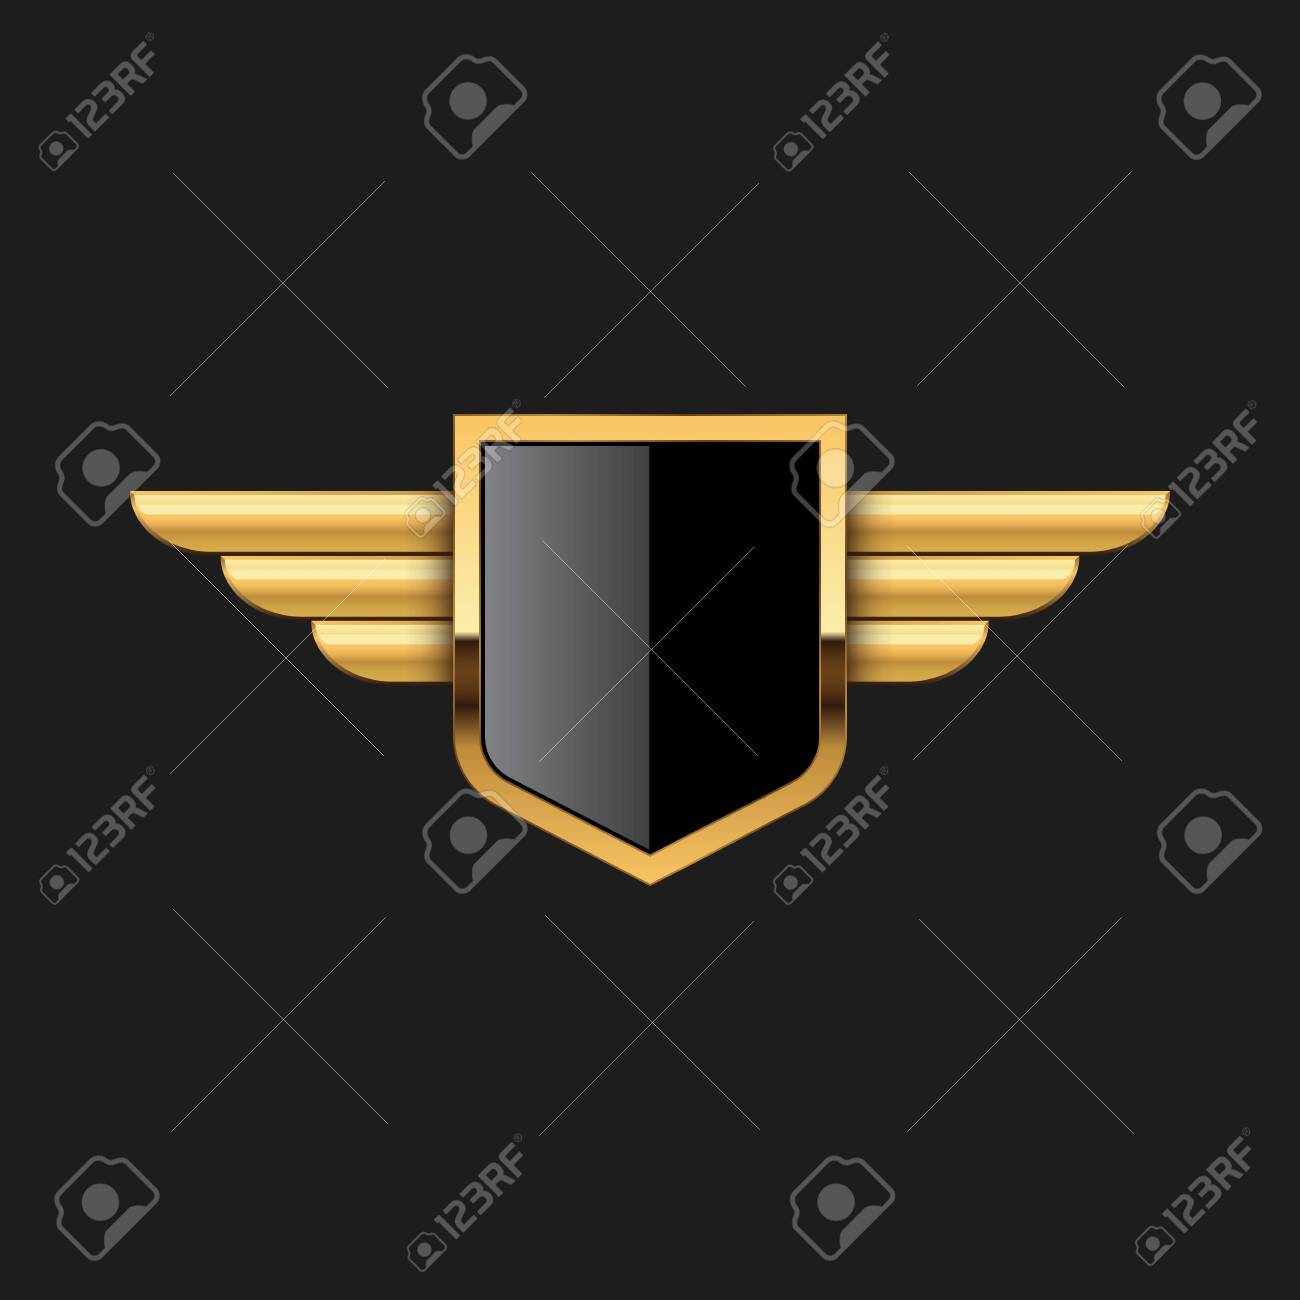 Blank Badge Shield Crest Label Armor Luxury Gold Design Element Template for logo background Card Invitations Decoration Element - 124388586